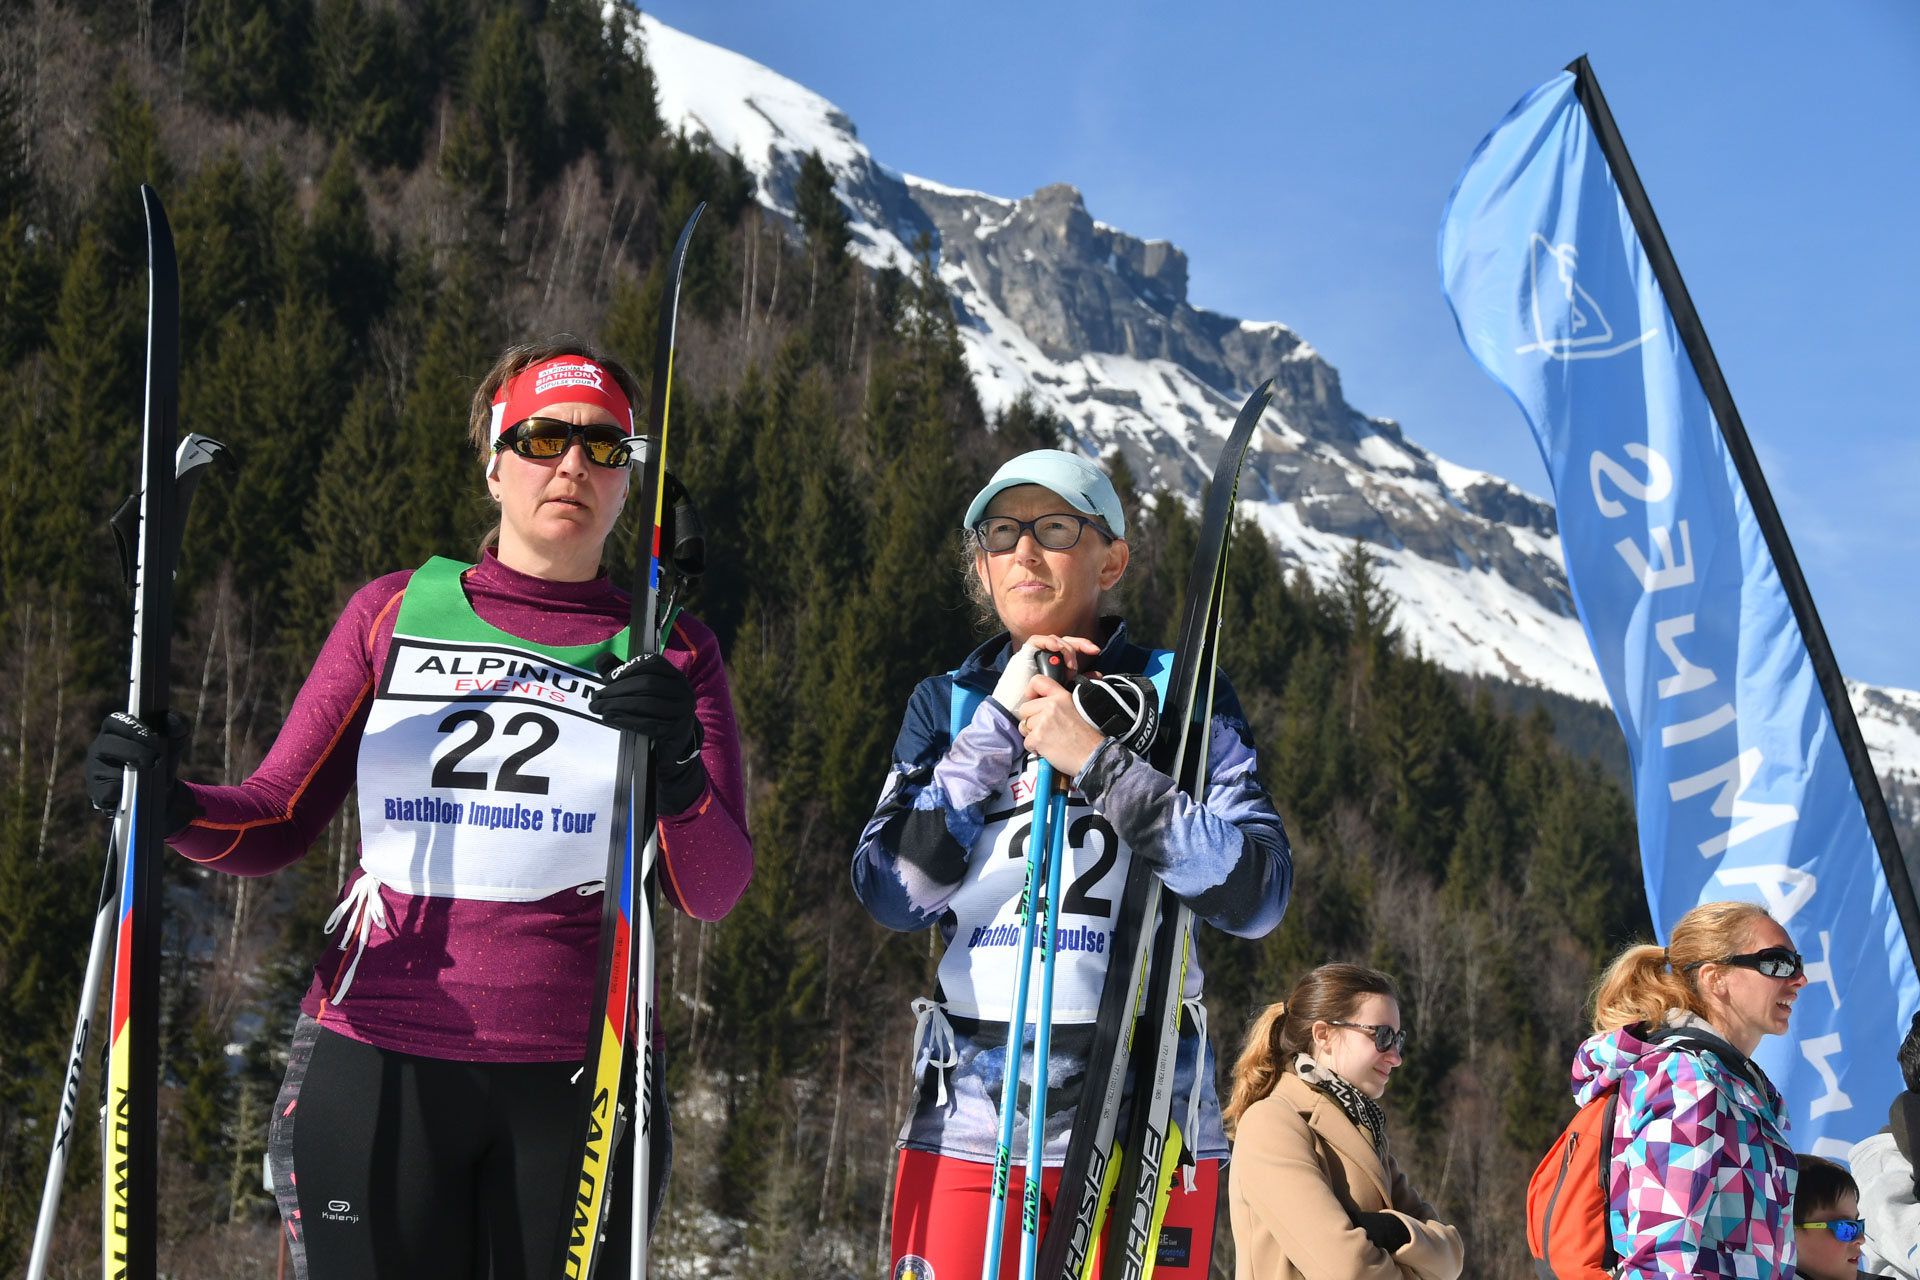 Alpinum-Biathlon-Impulse-Tour-2019©JulieRuly_189